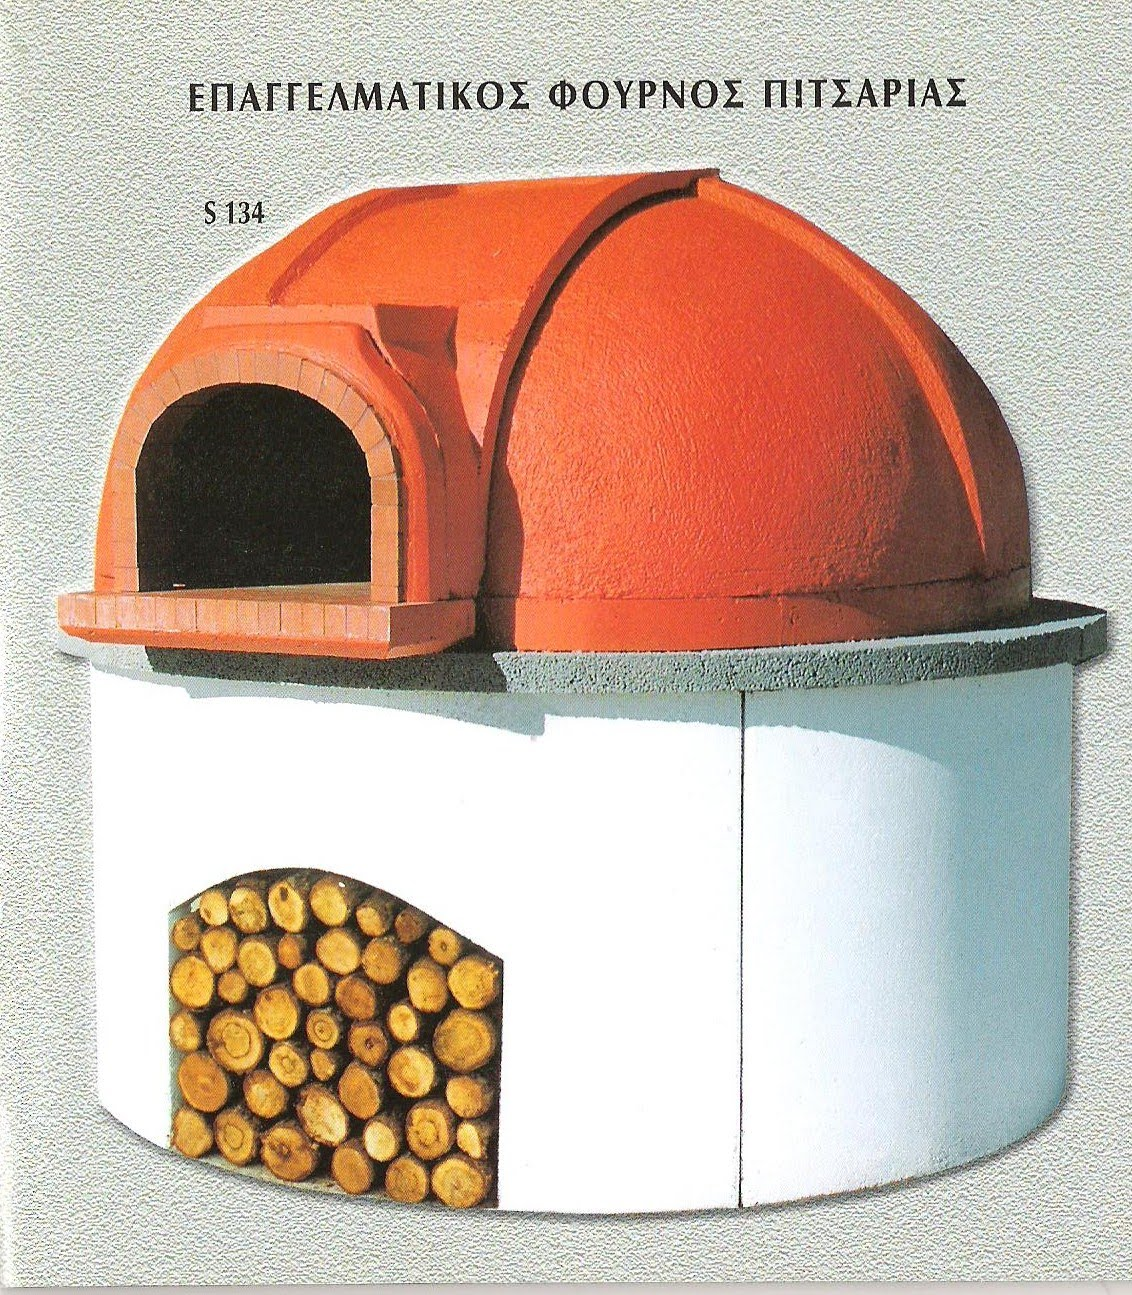 http://www.tzakia-stergioulas.com